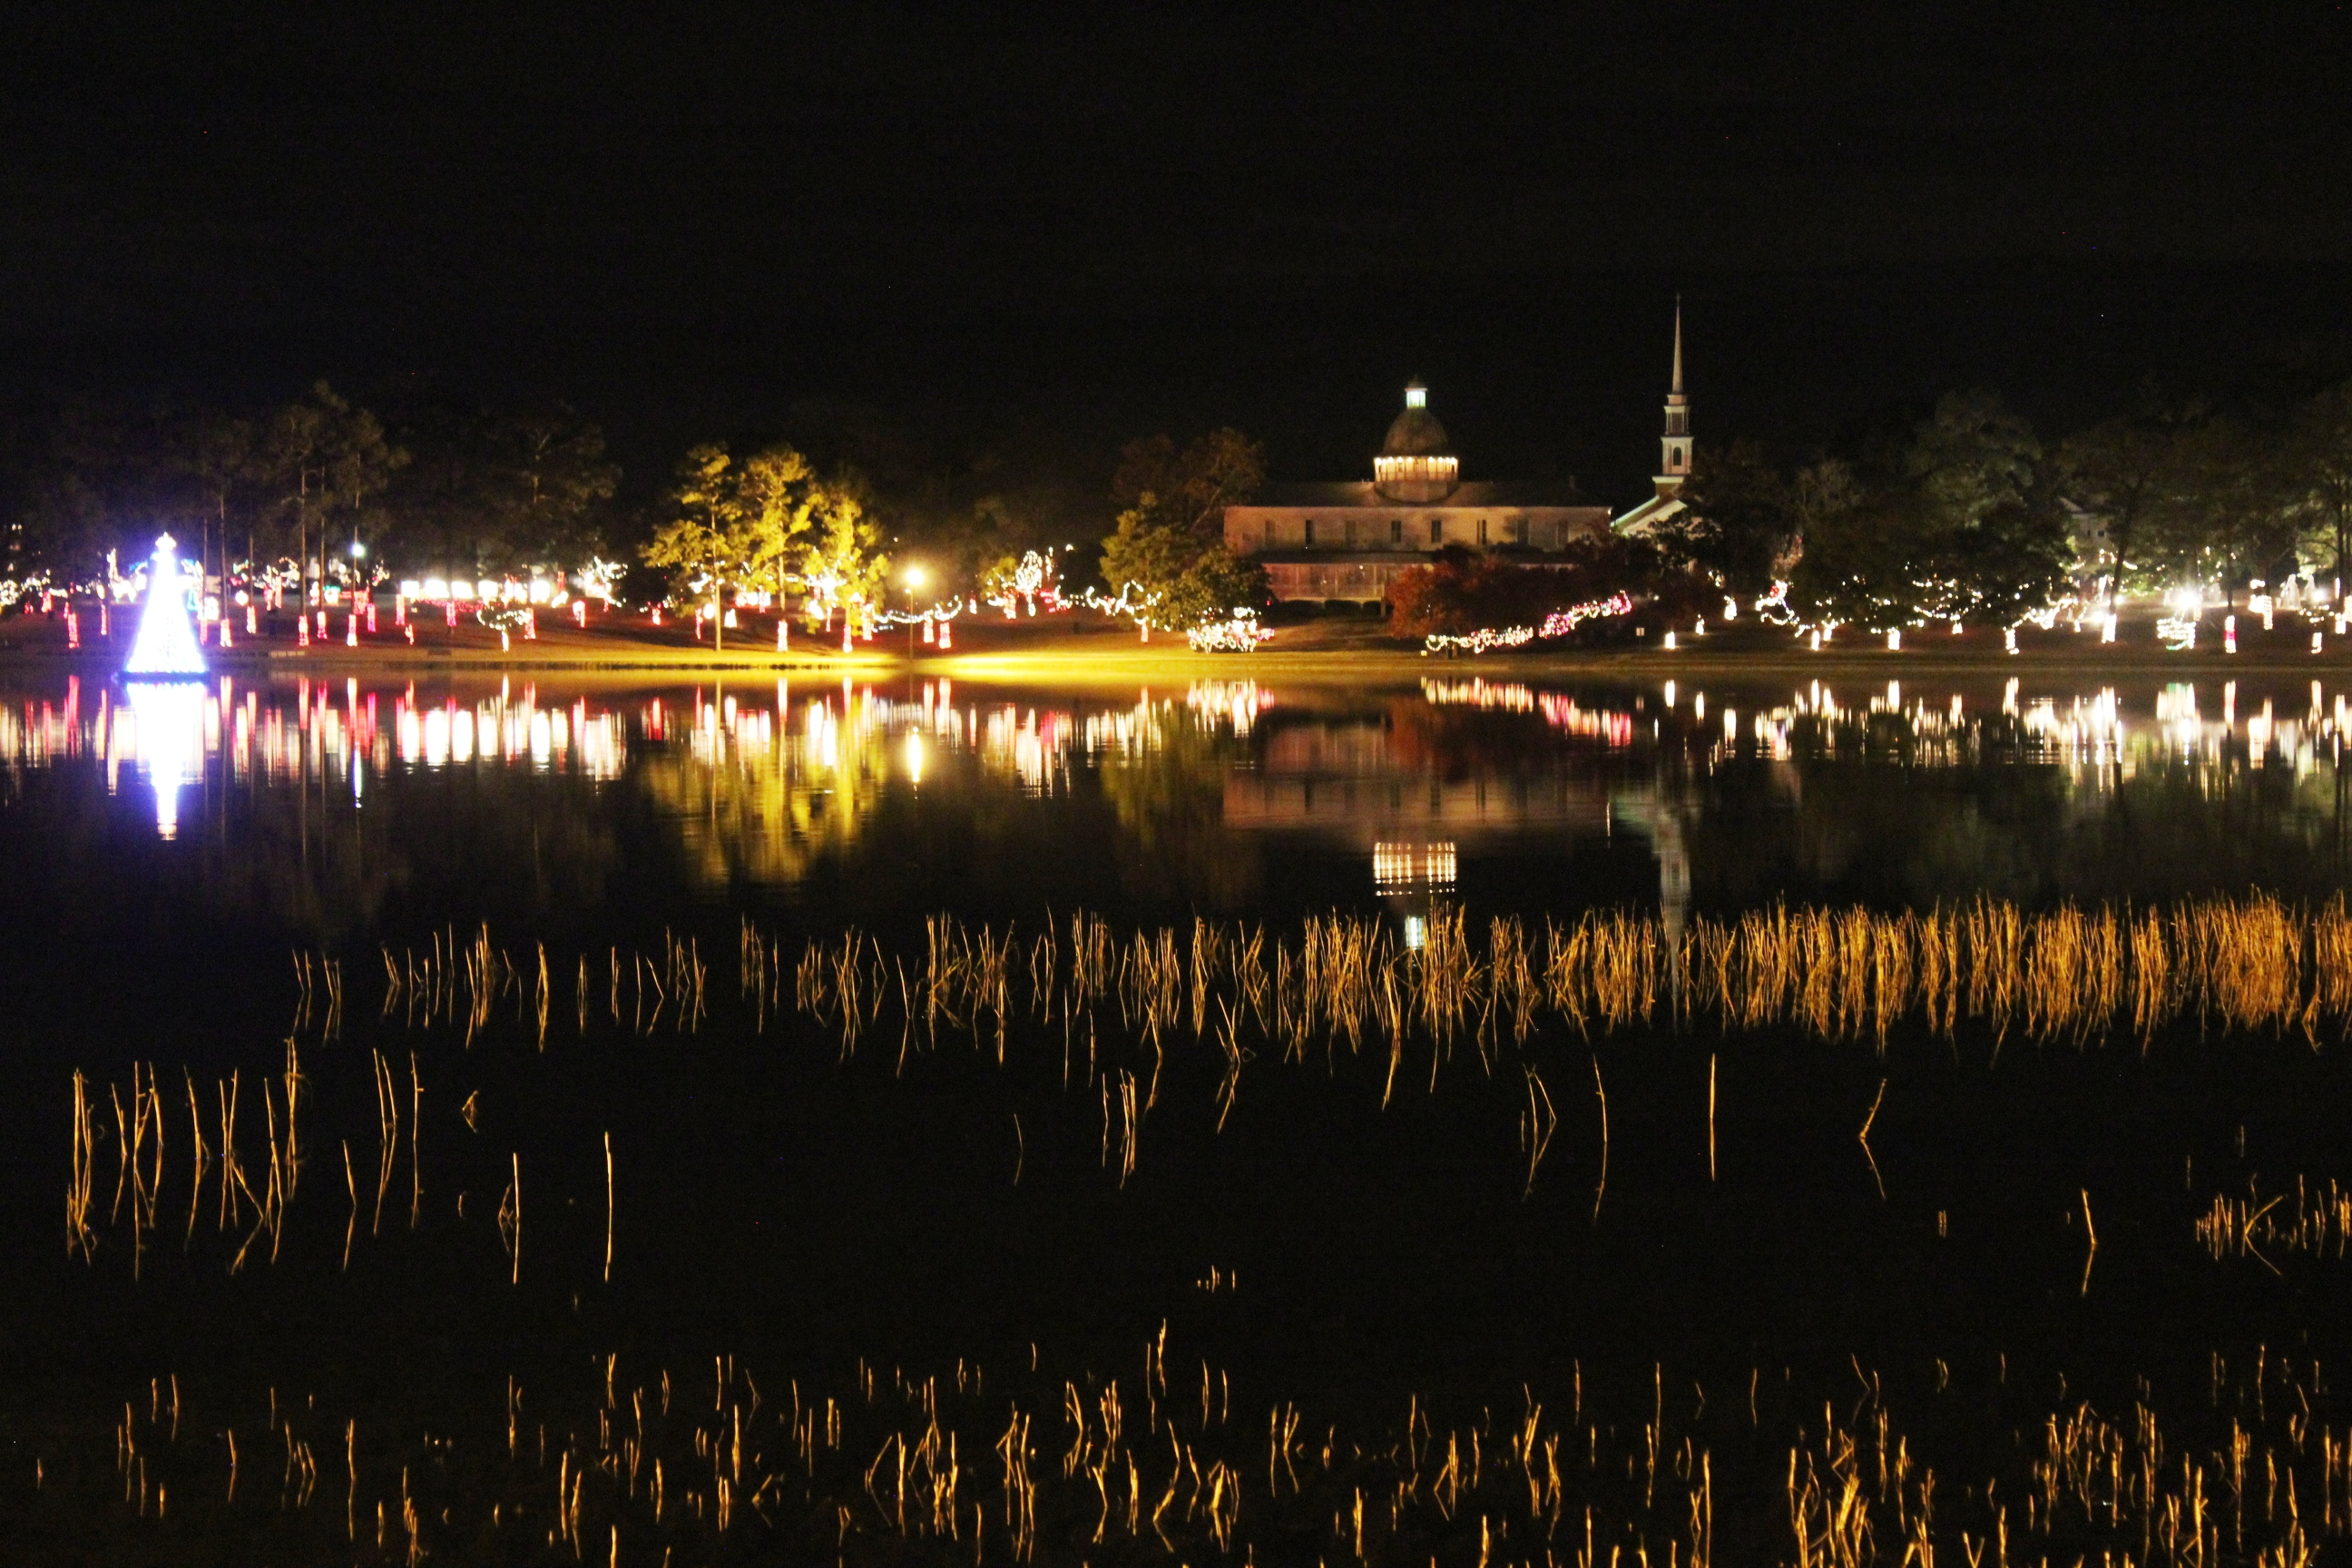 Defuniak Springs Christmas Reflections 2020 Millions of Christmas lights on display in DeFuniak Springs